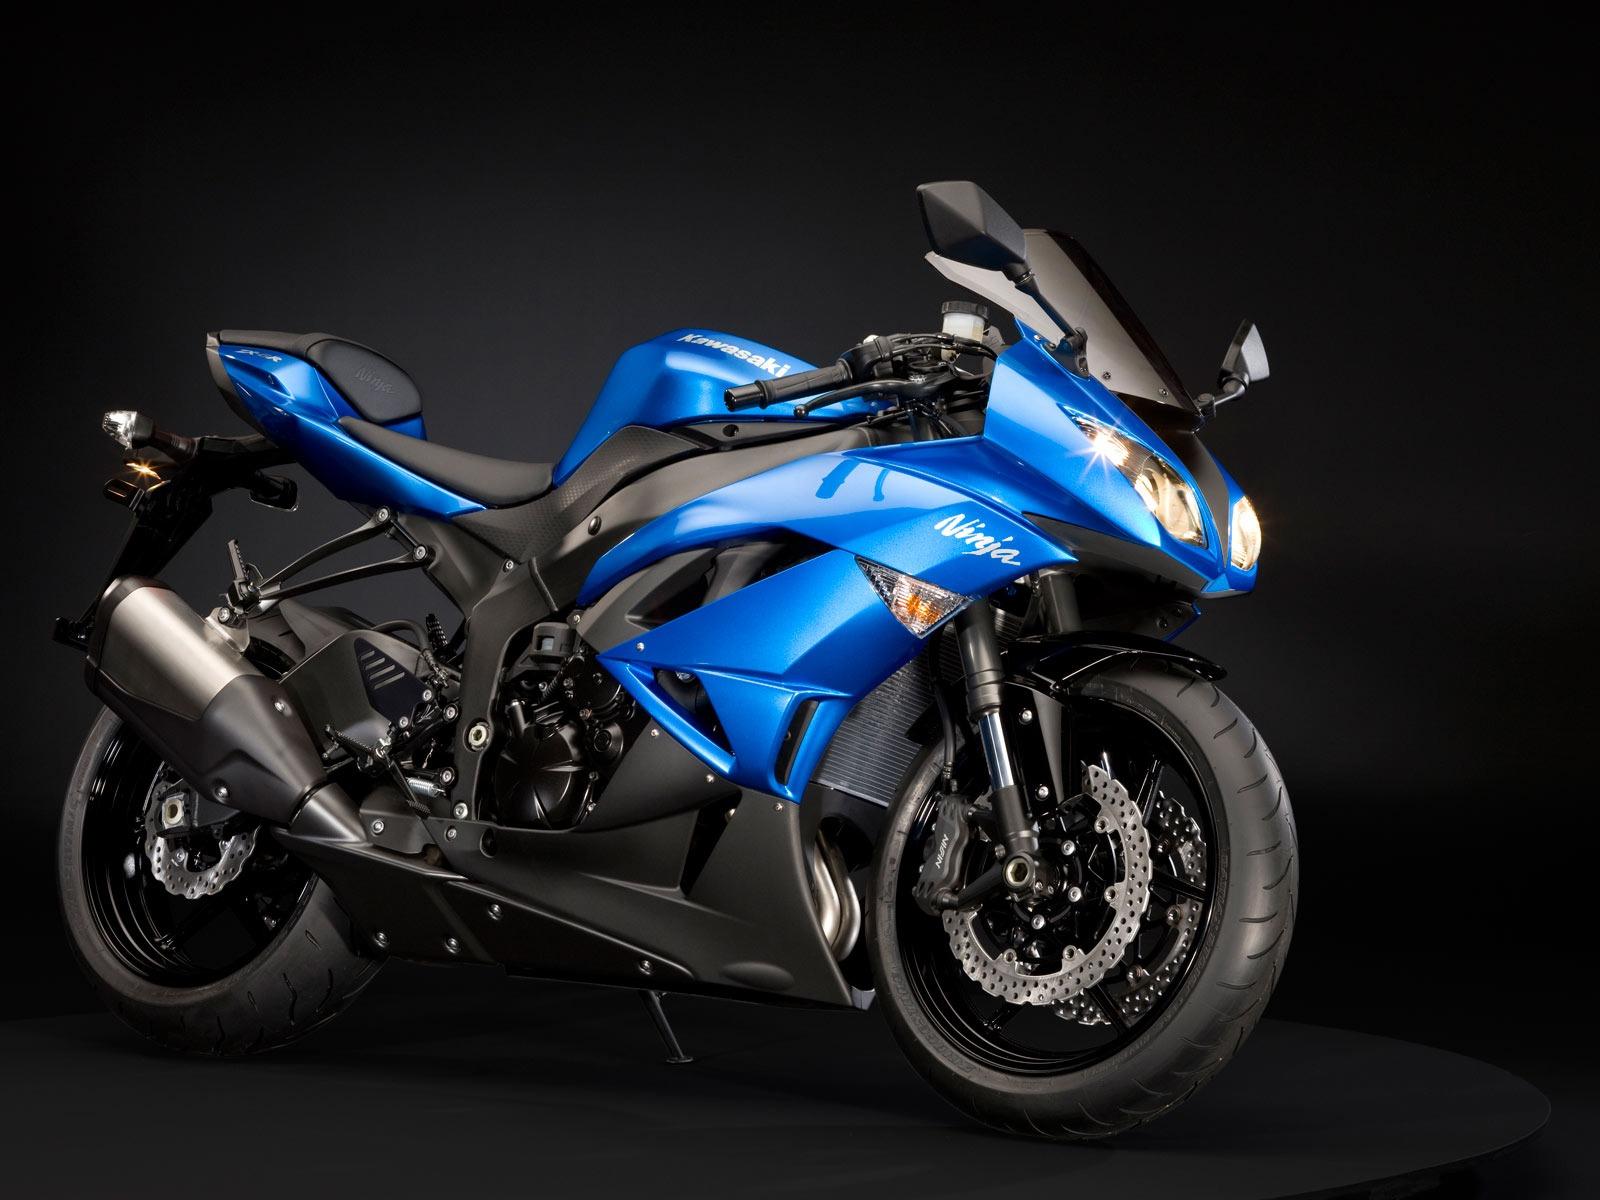 Kawasaki Ninja ZX 6R Blue